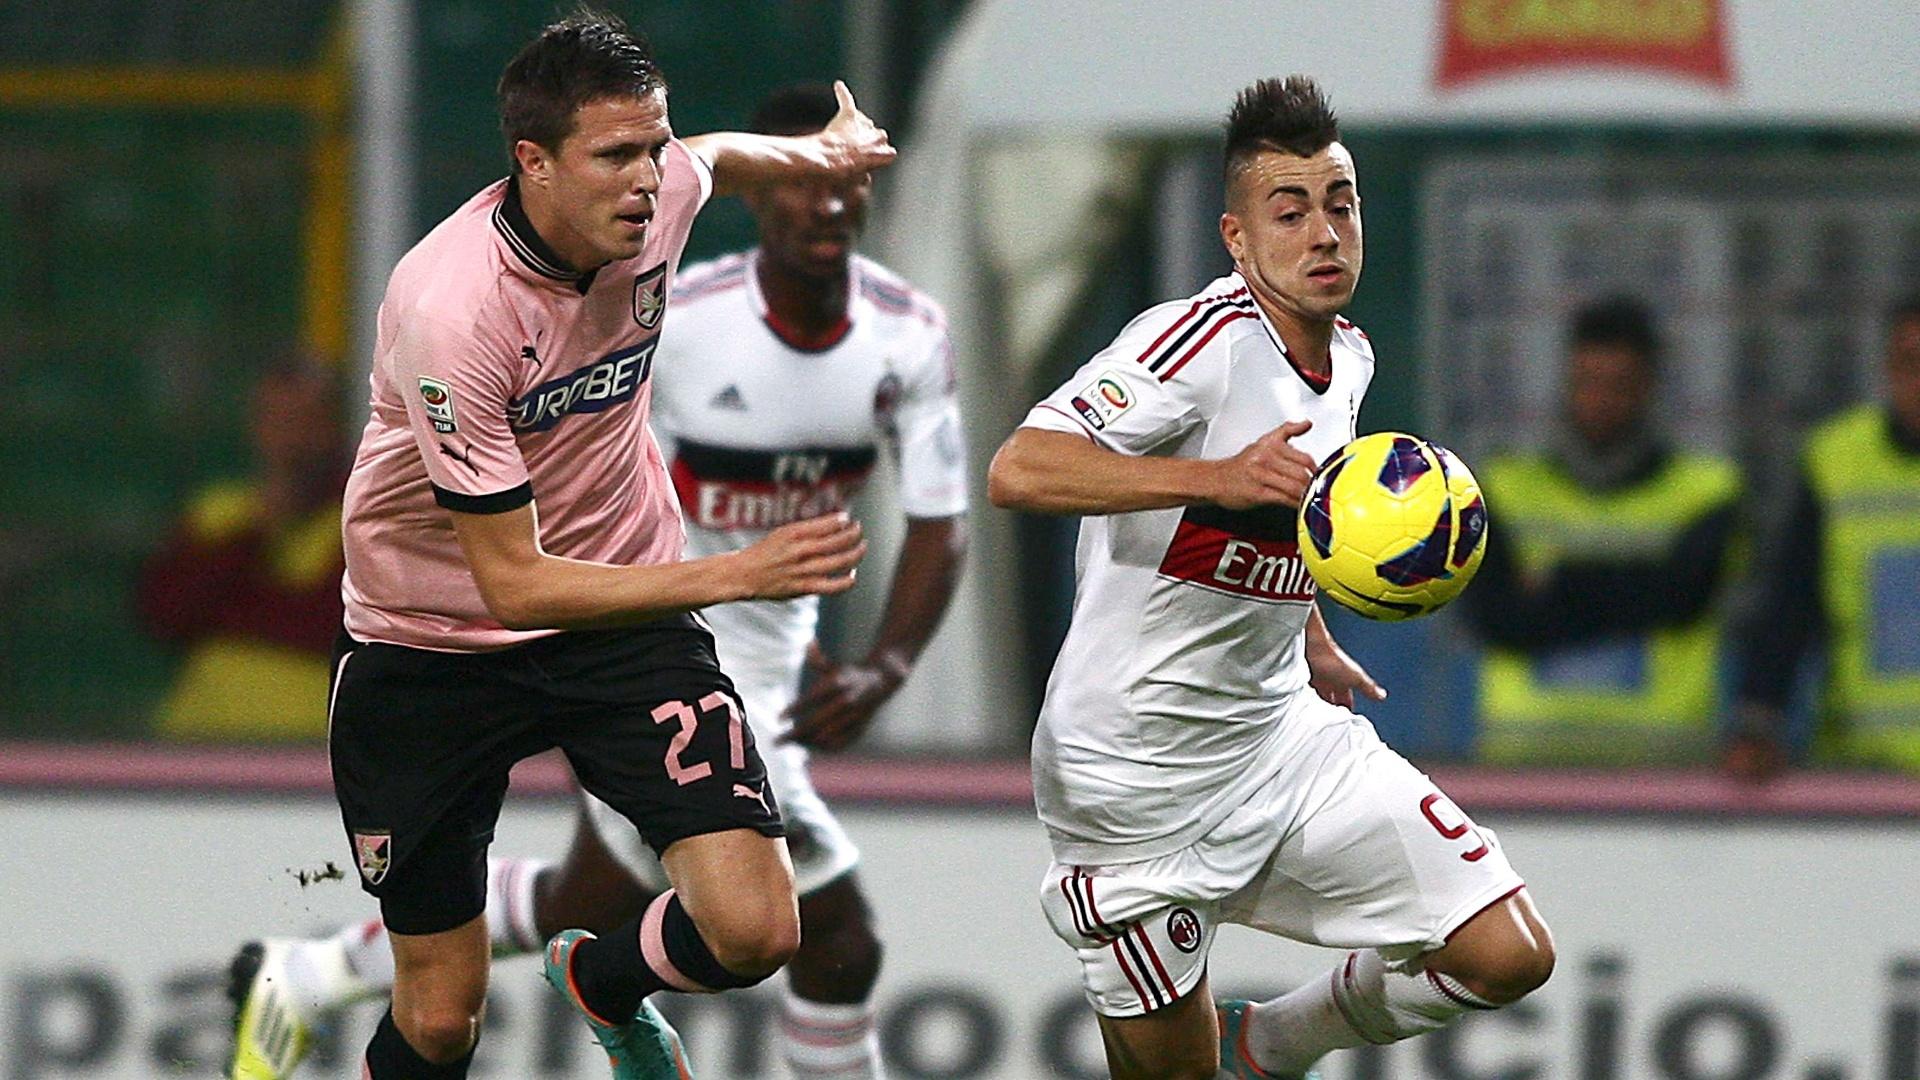 Atacante do Milan El Shaarawy (d) disputa a jogada contra adversário do Palermo